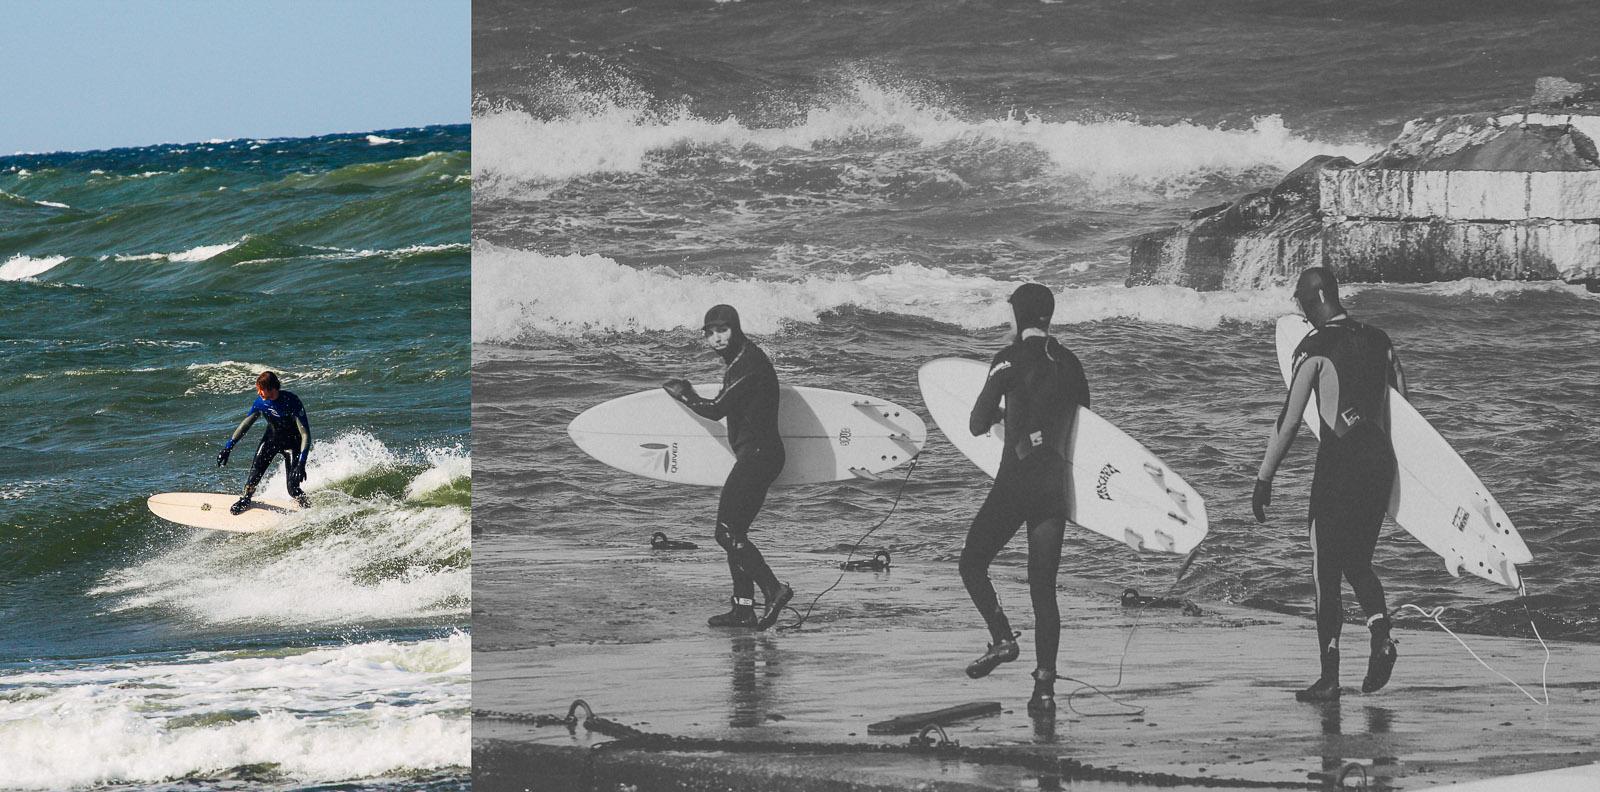 Sunshinestories-Surf-Vik-Österlen-Skåne-vik collage